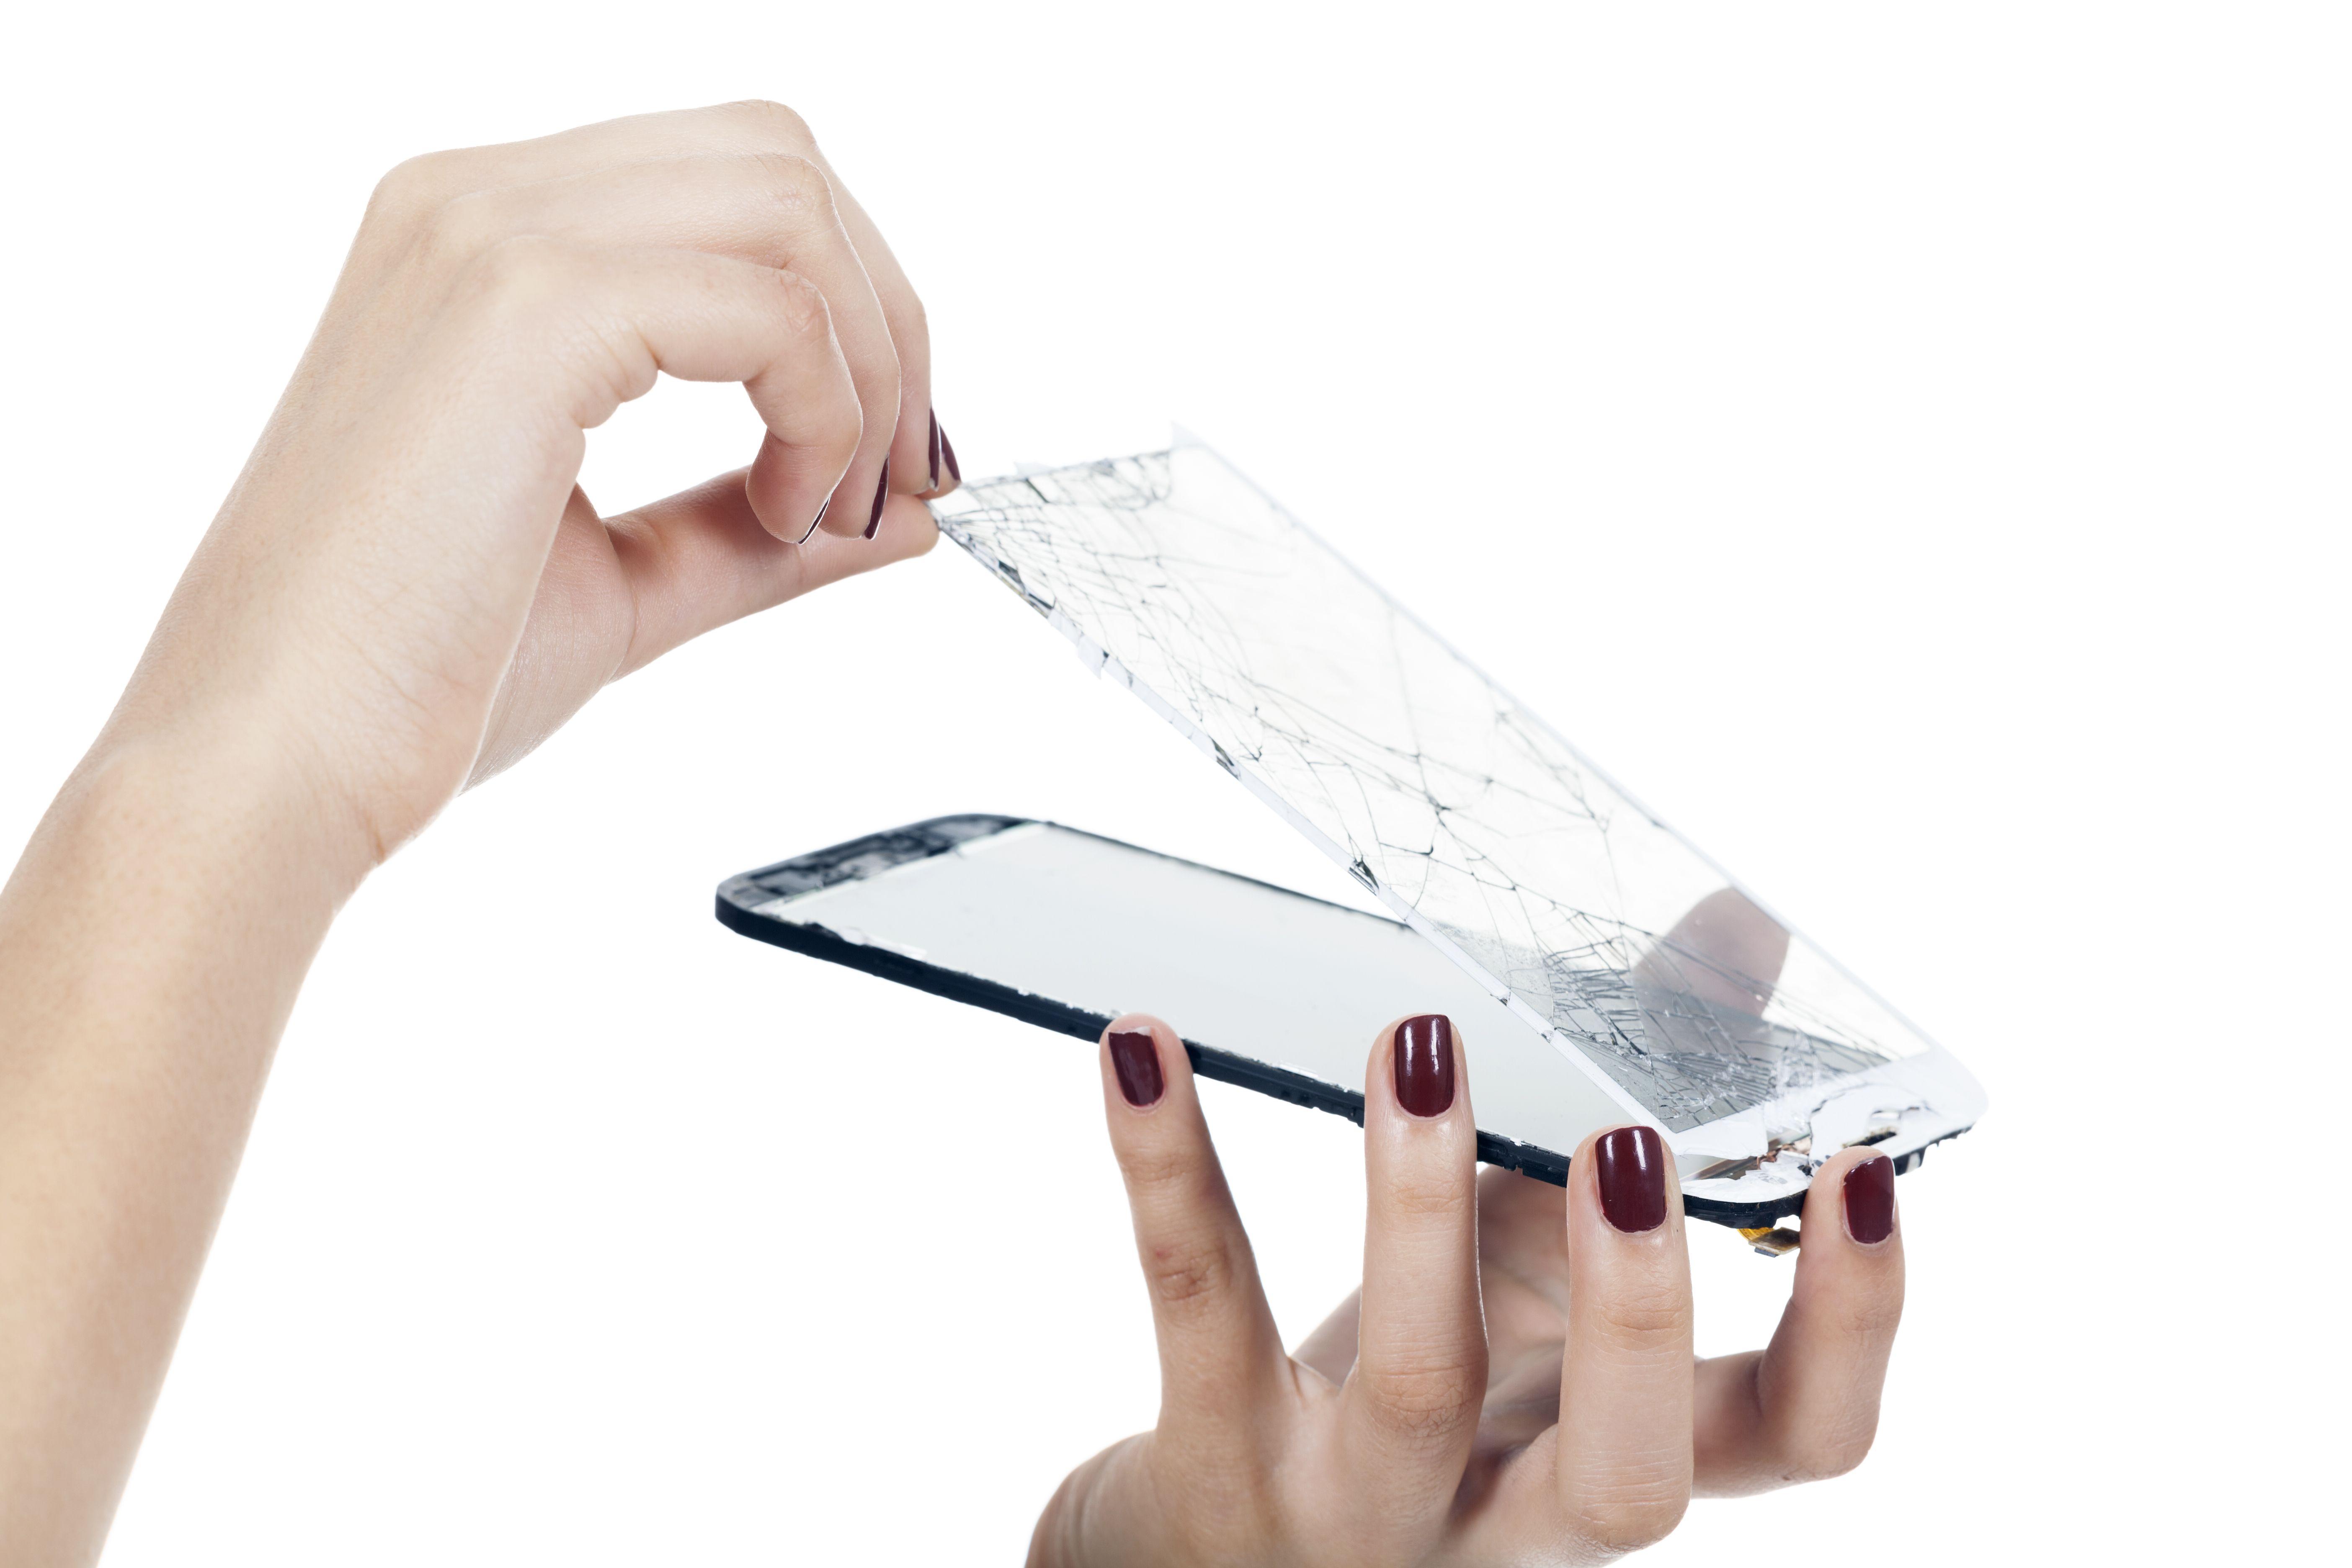 Reparar pantalla de móvil en La Paz, Madrid